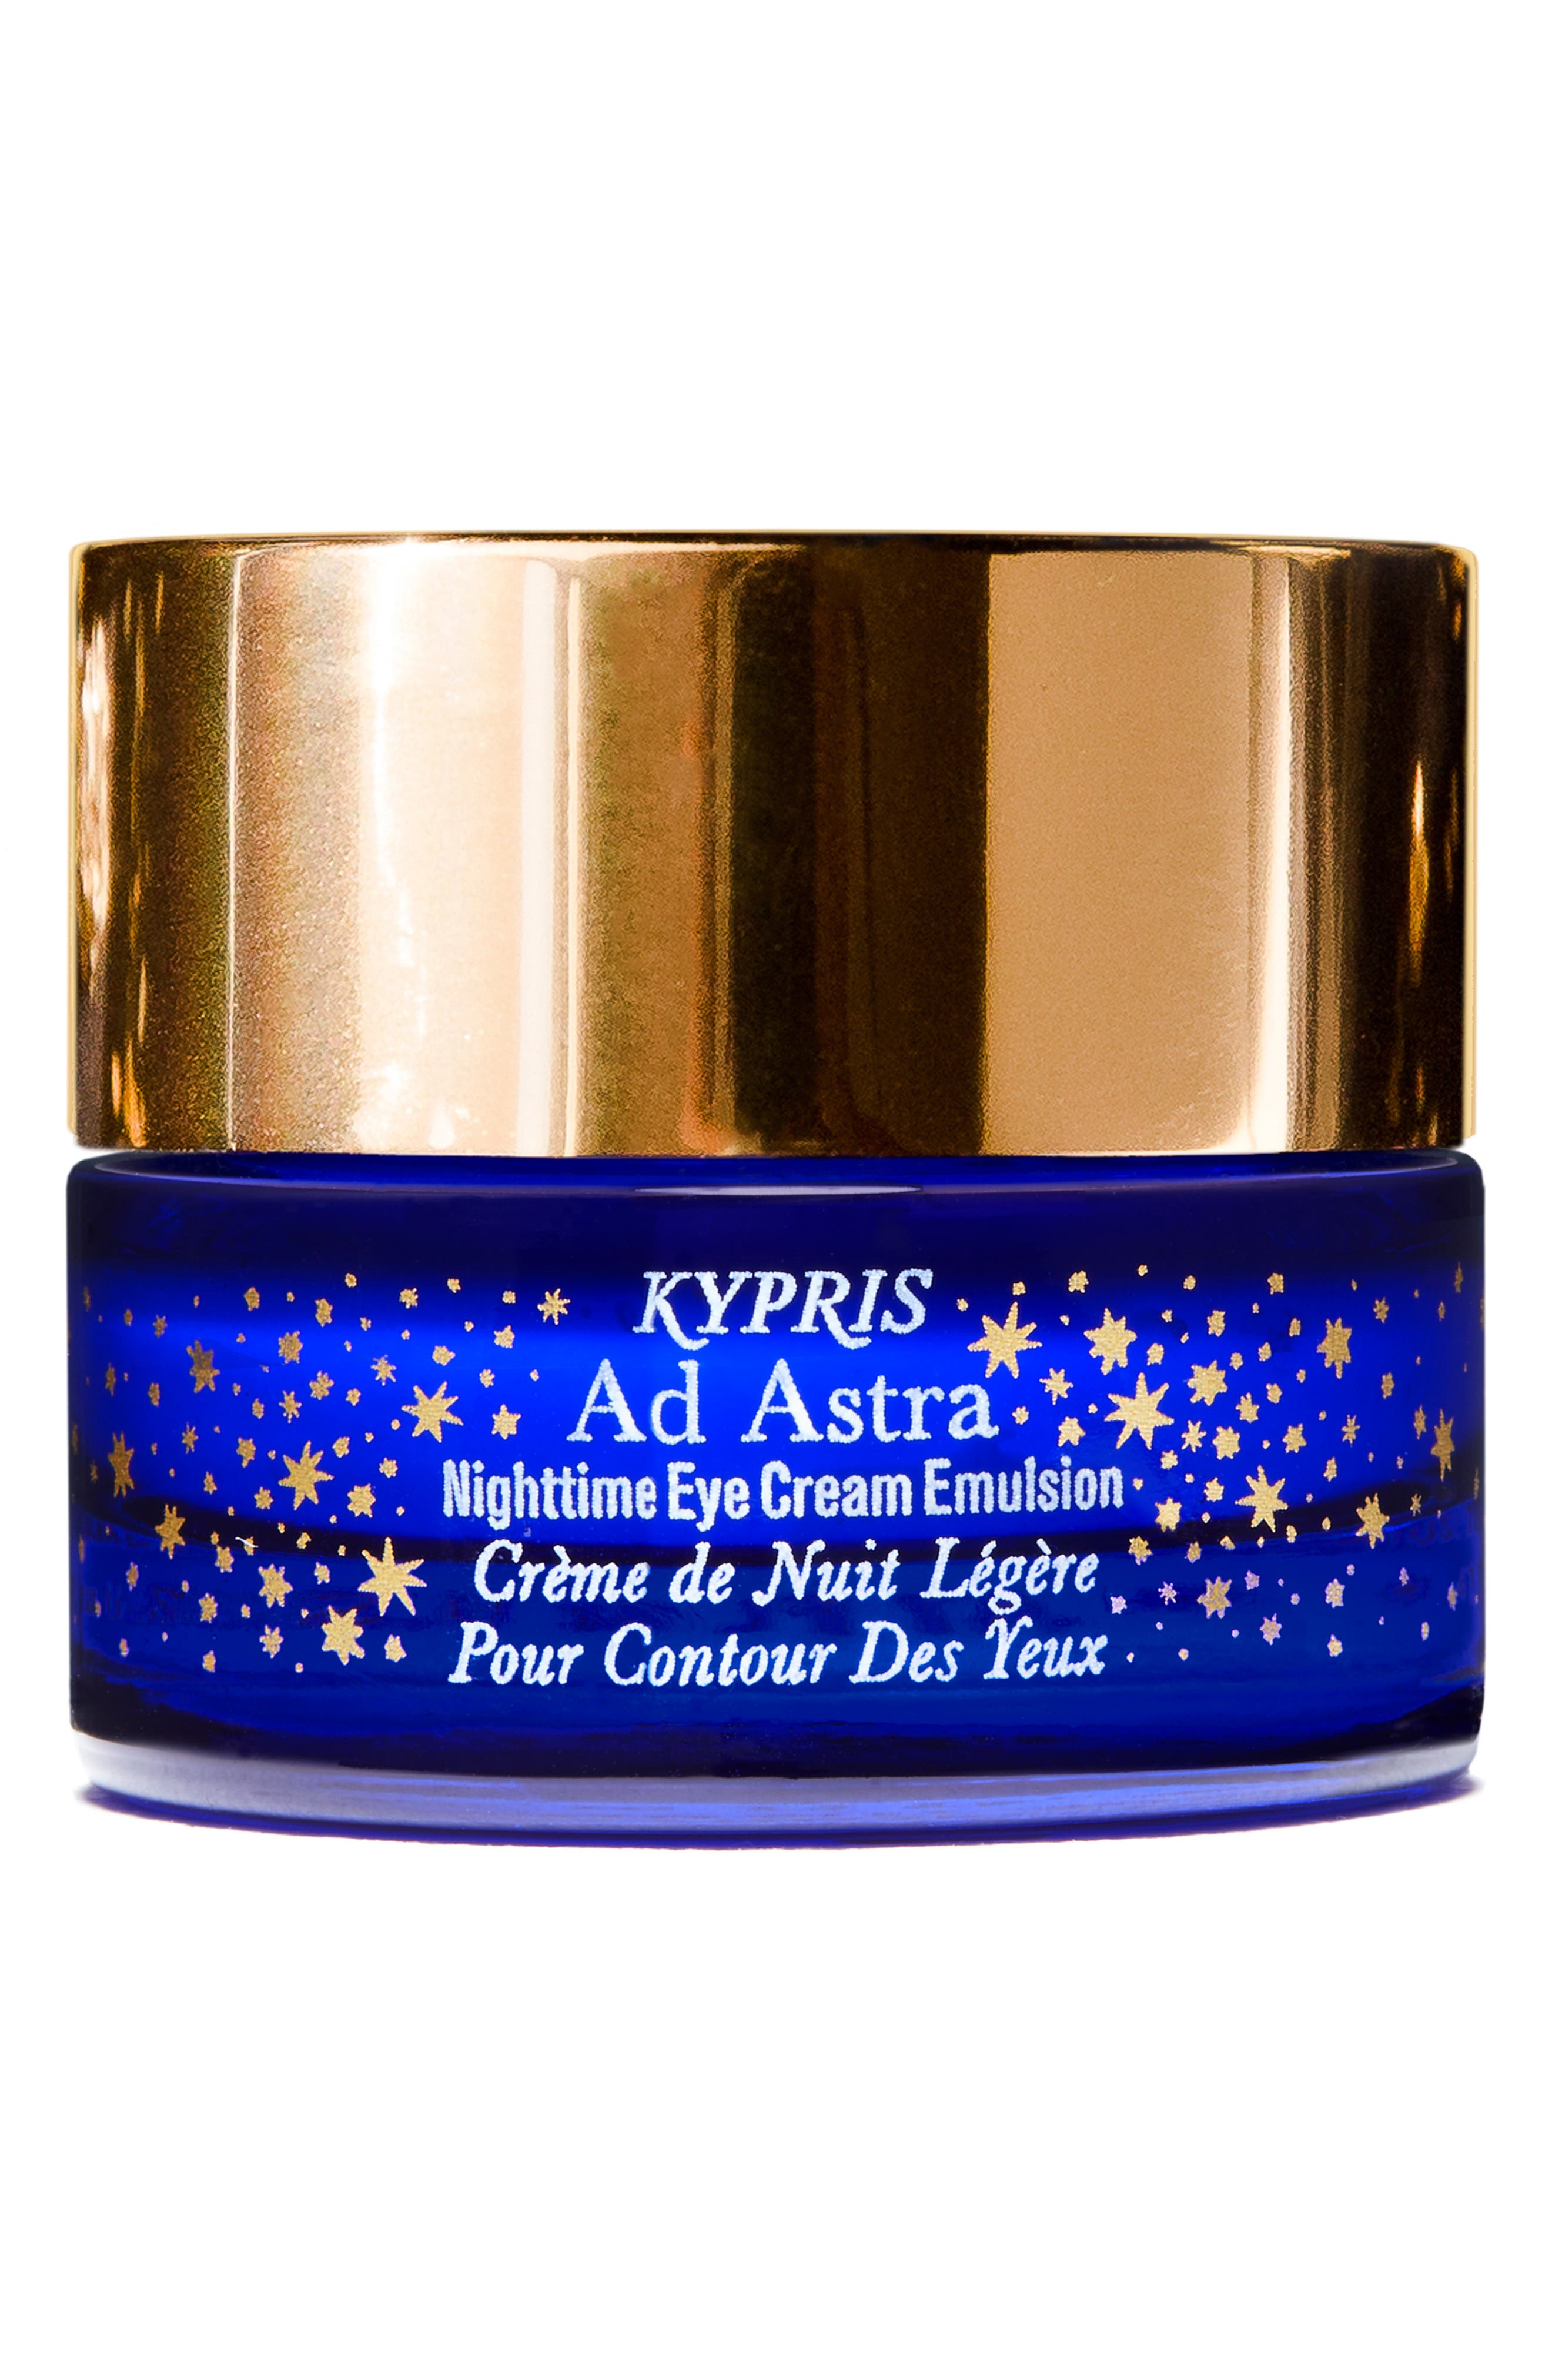 Ad Astra Nighttime Eye Cream Emulsion